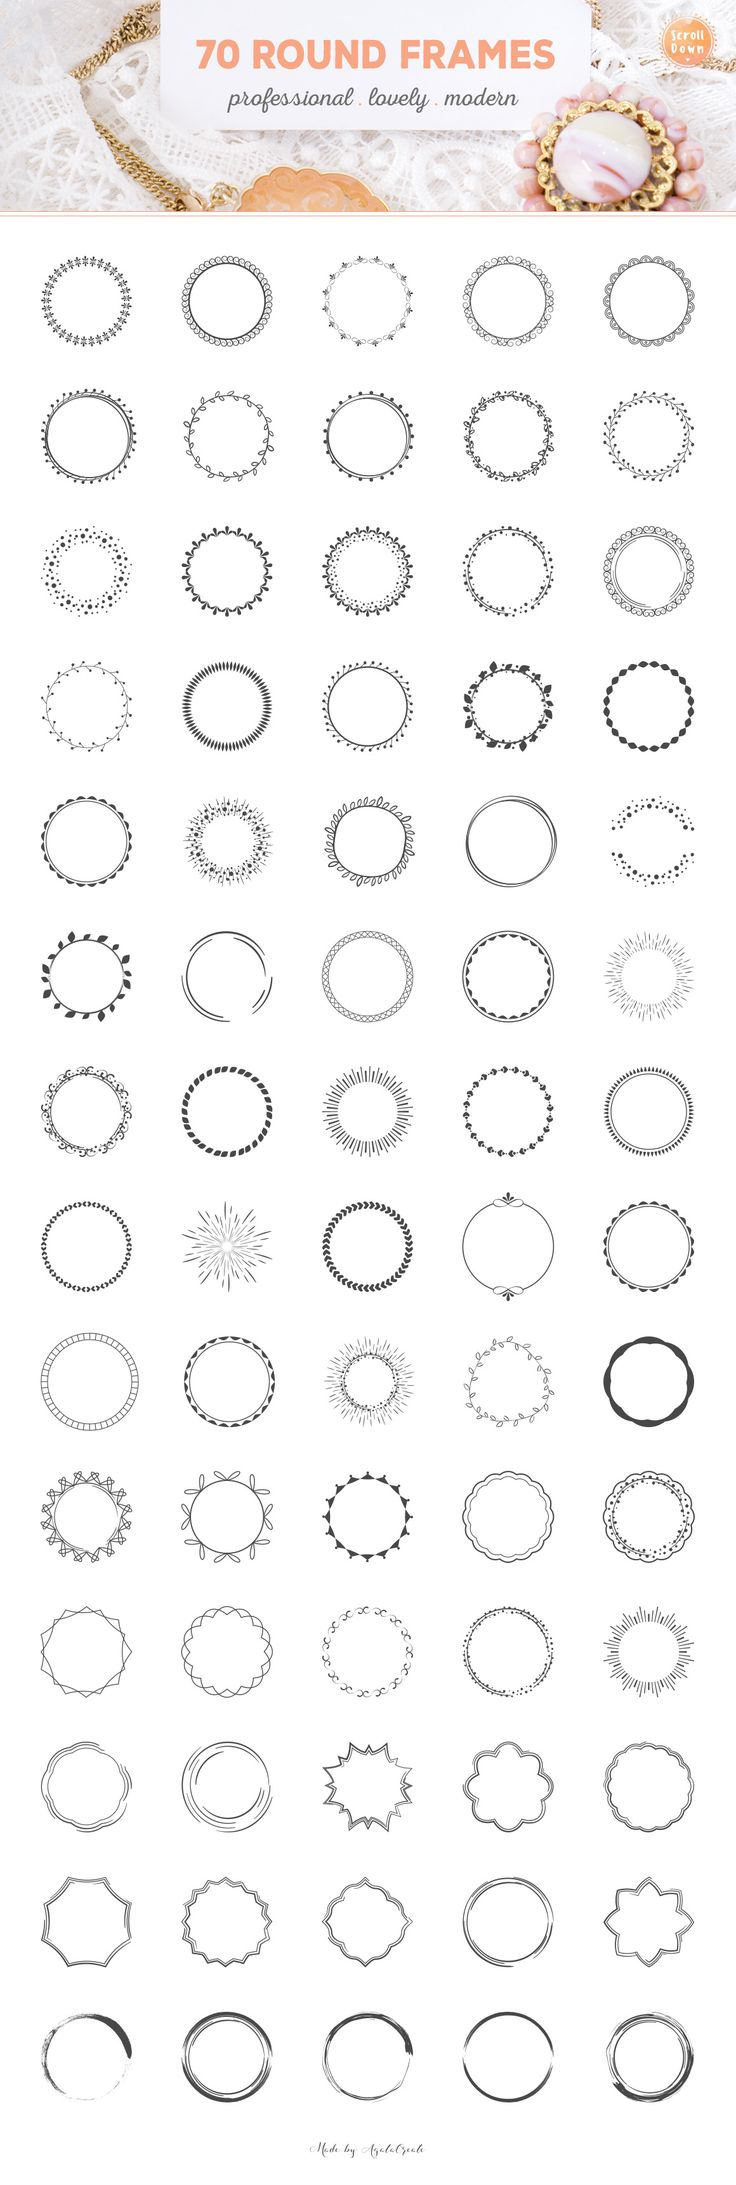 LogoCreator 380+ Elements & Mock-Ups by AgataCreate on @creativemarket